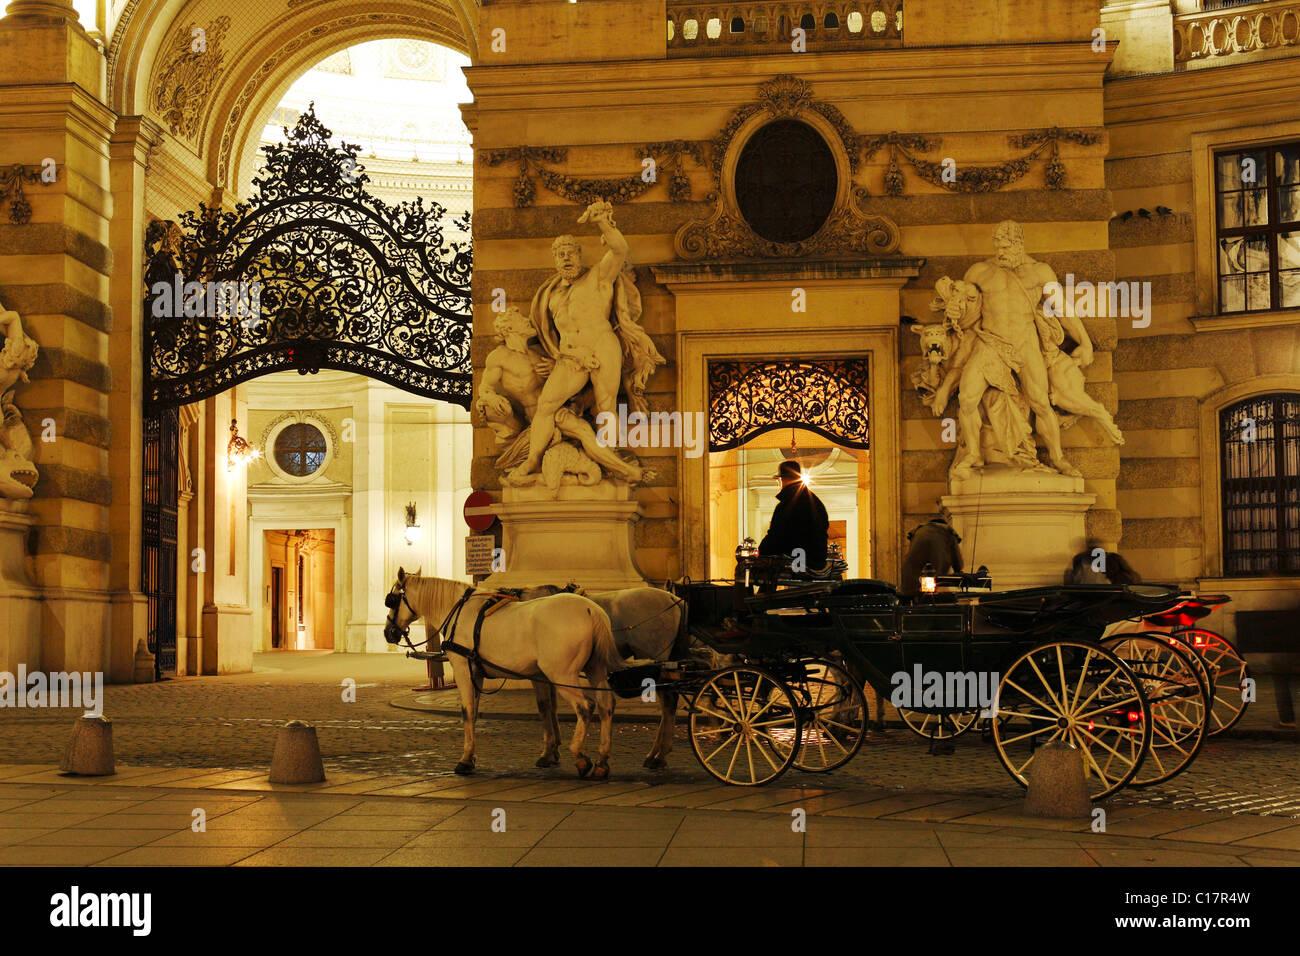 Hackney carriage, fiaker, outside the Hofburg on Michaelerplatz, Hofburg Imperial Palace, Vienna, Austria, Europe - Stock Image